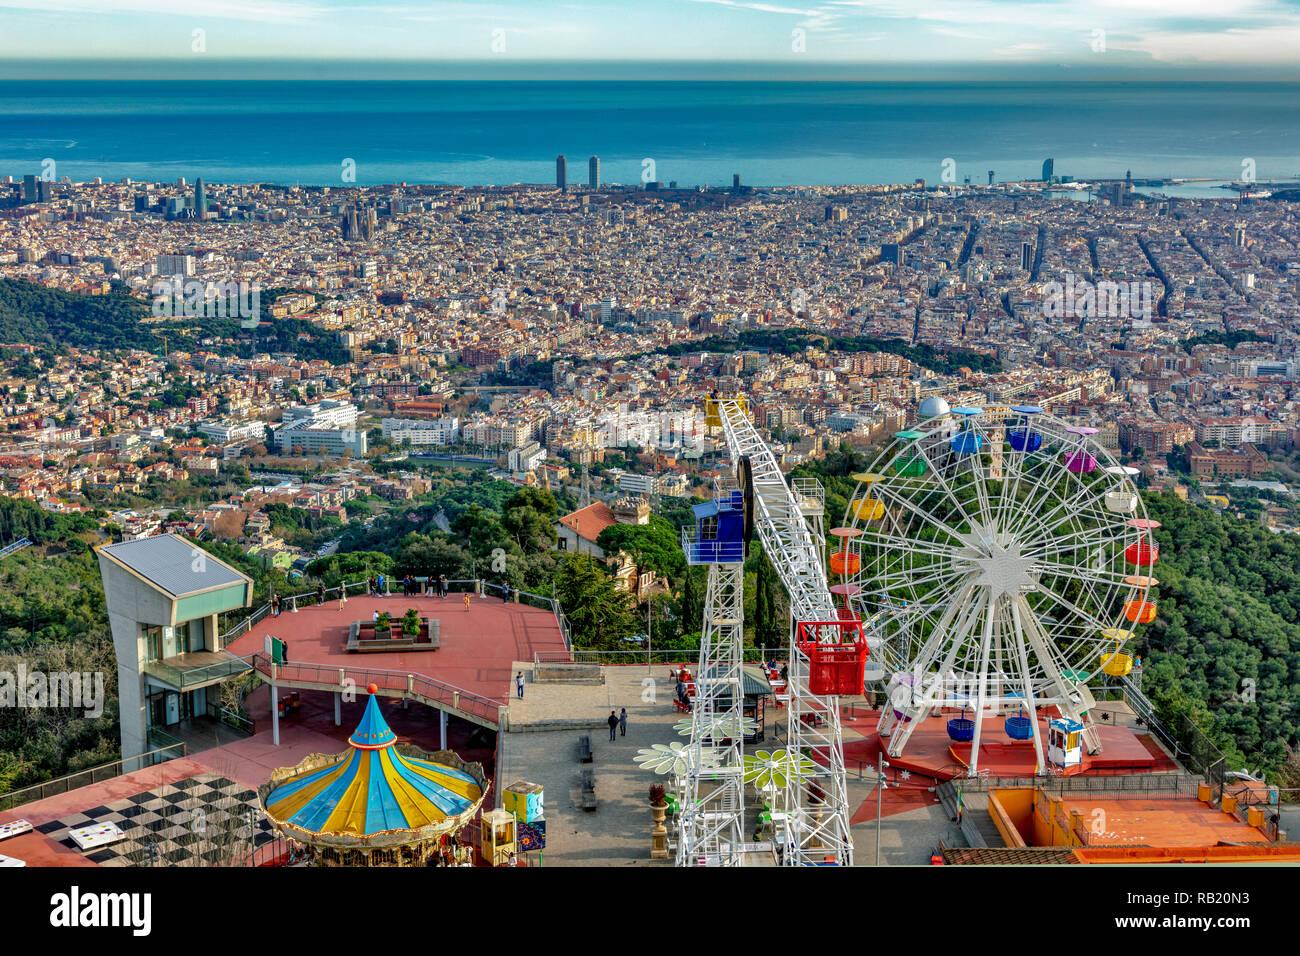 Freizeitpark Parque de Atracciones, Tibidabo, Barcelona, Katalonien, Spanien - Stock Image